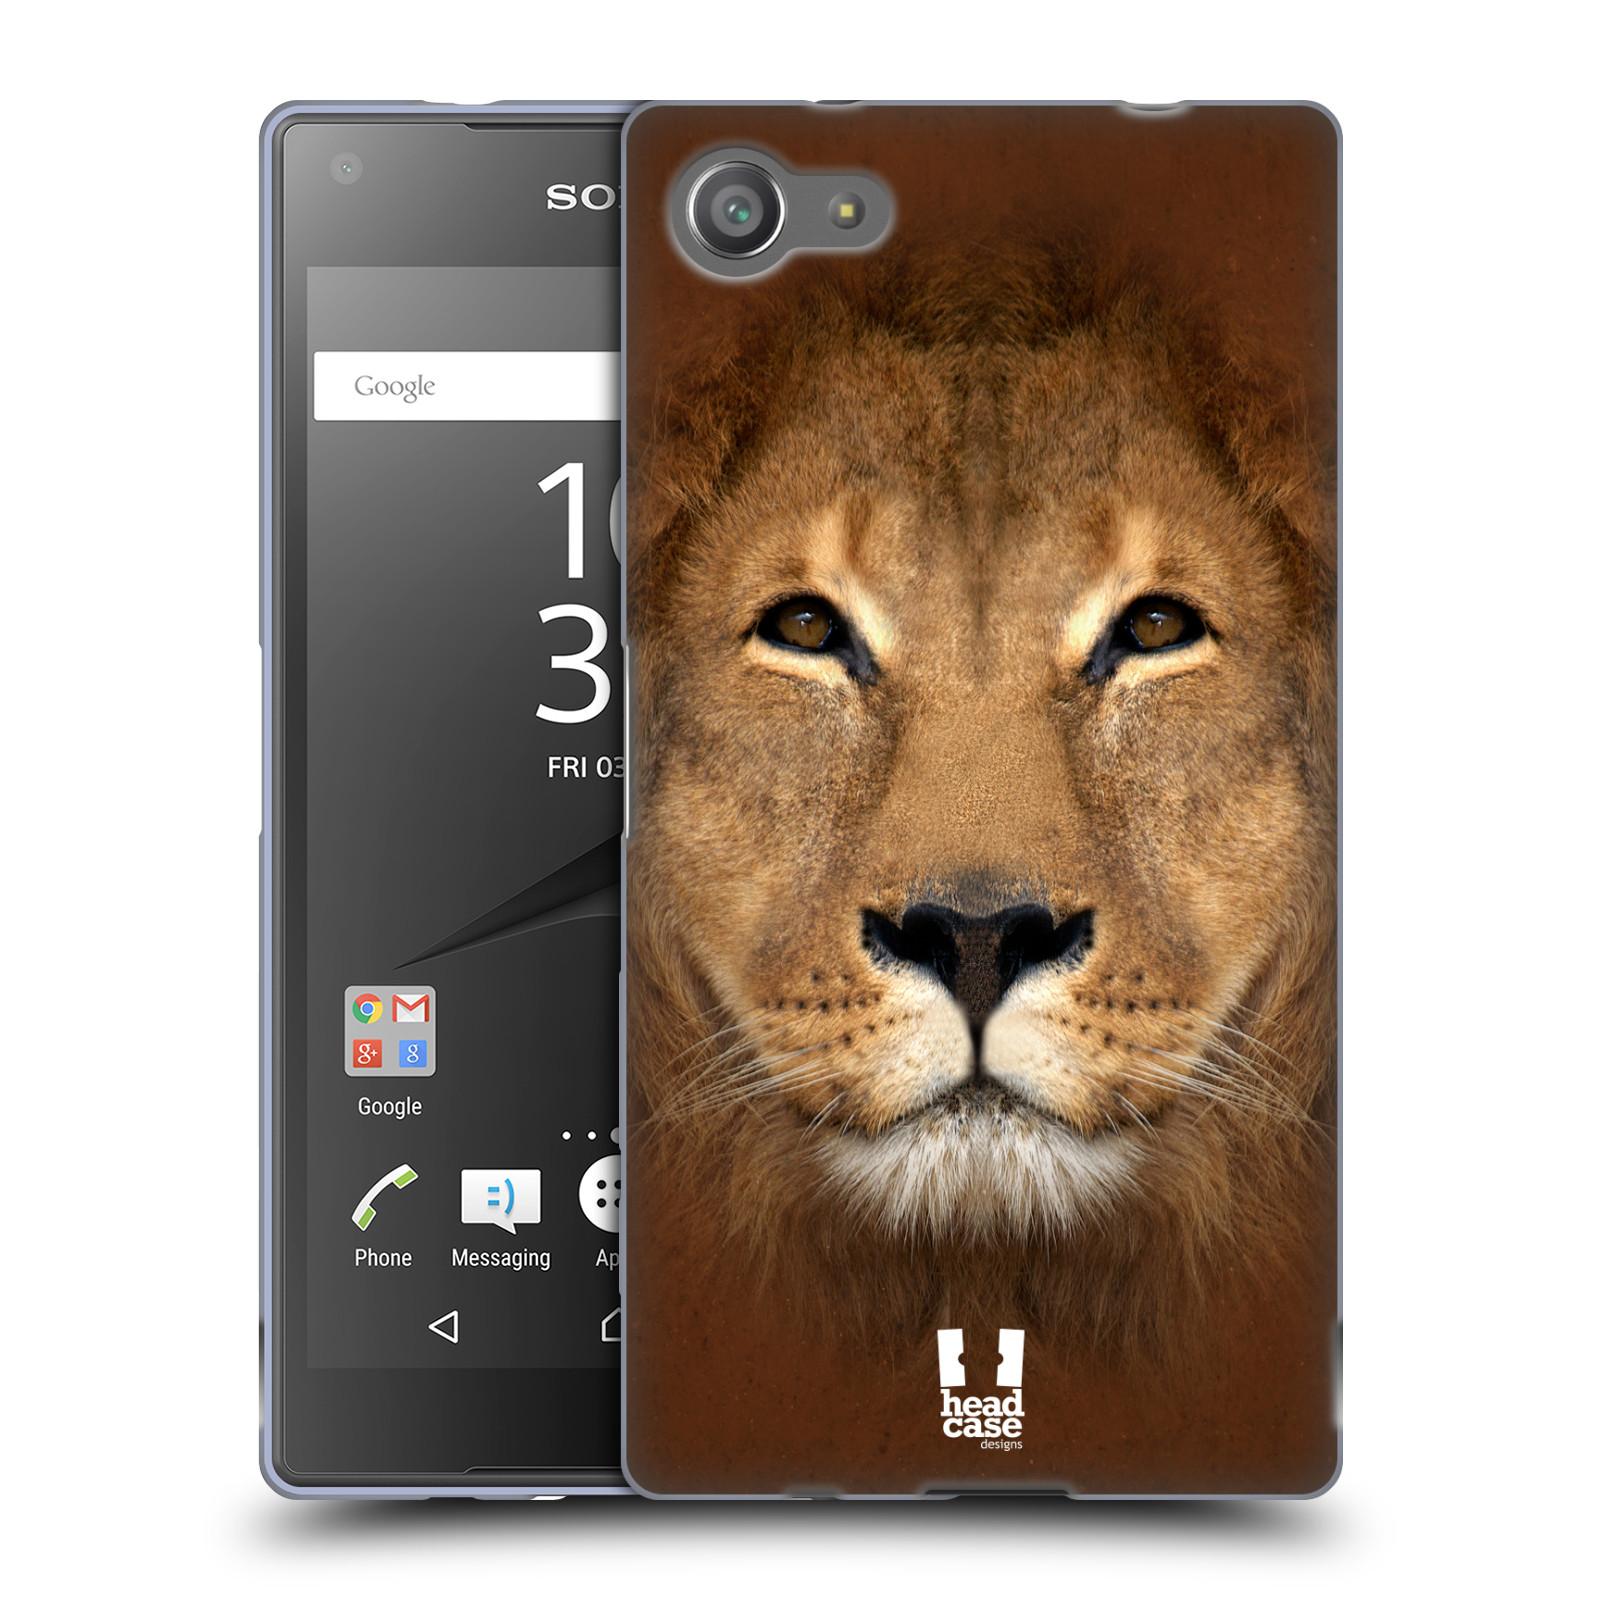 HEAD CASE silikonový obal na mobil Sony Xperia Z5 COMPACT vzor Zvířecí tváře 2 Lev